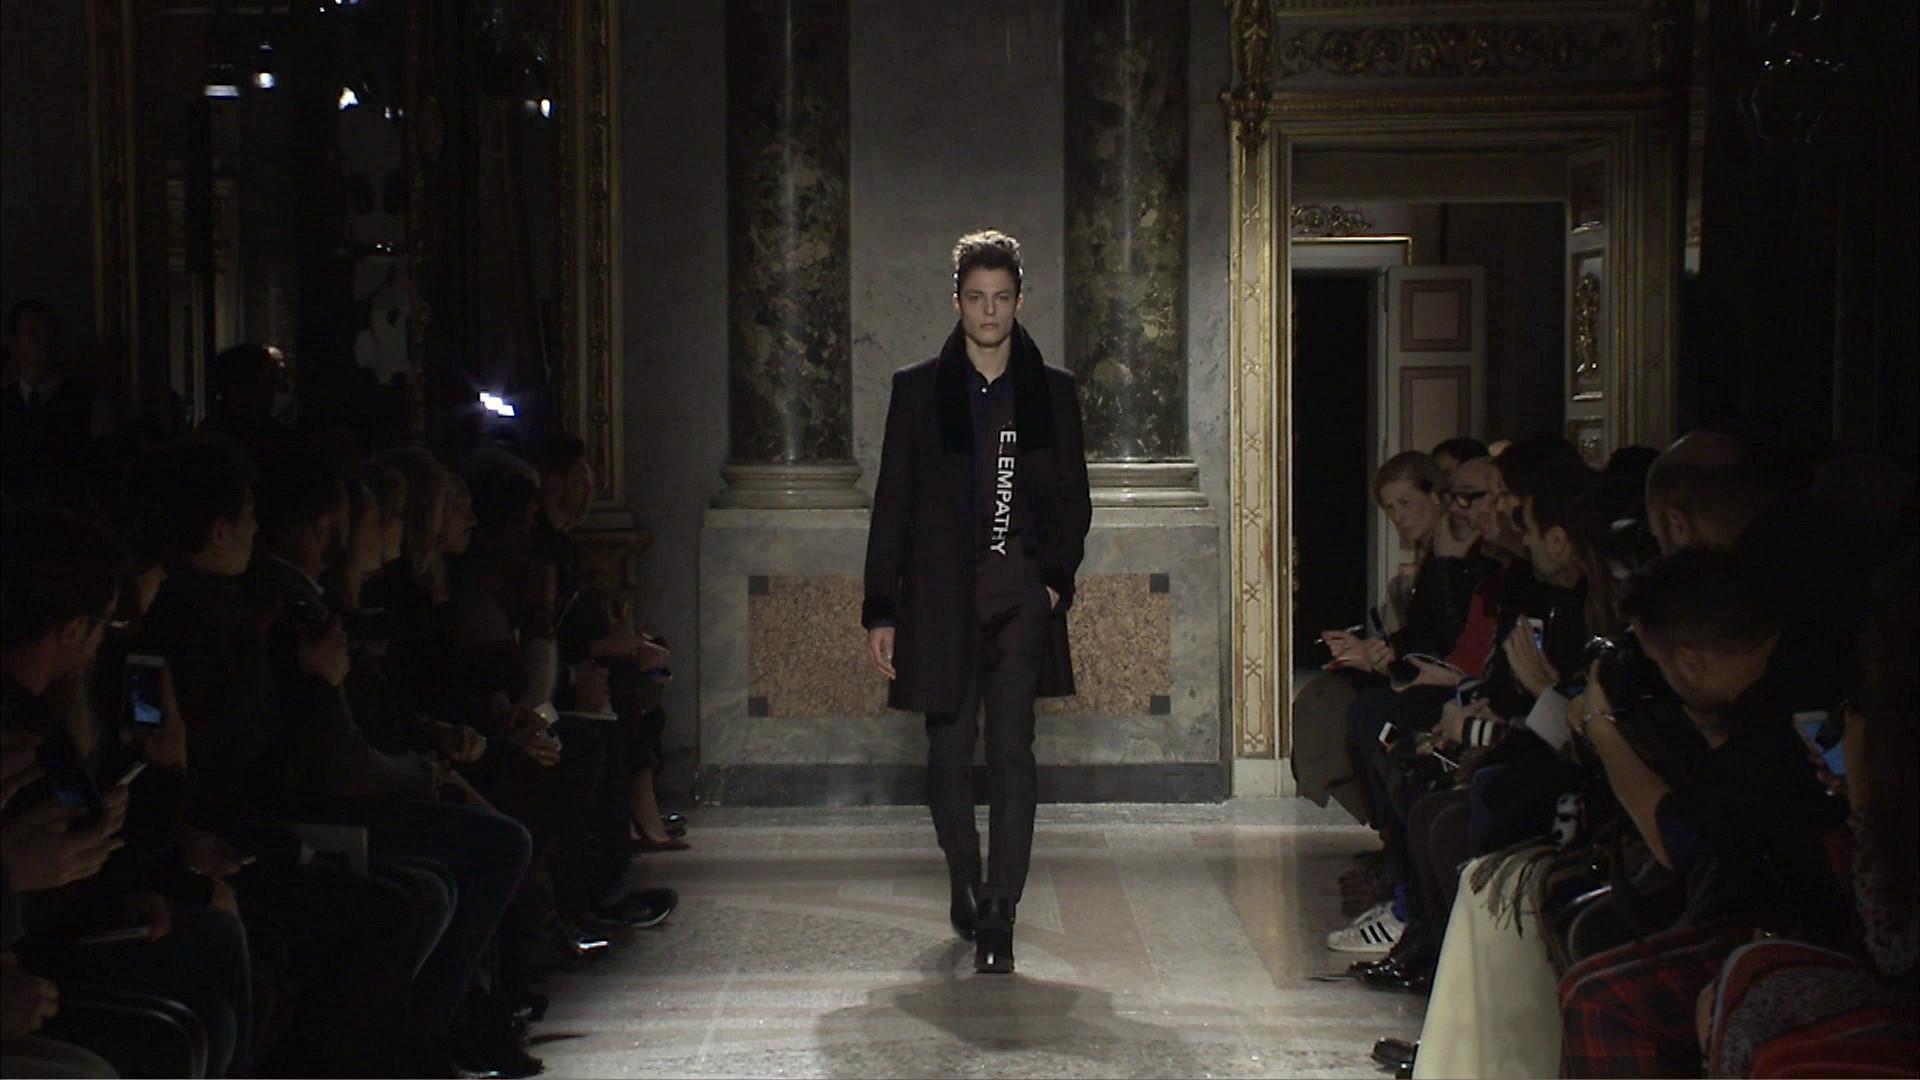 Roberto Cavalli Fall Winter 2015-16 Men's Fashion Show - Milan Fashion Week